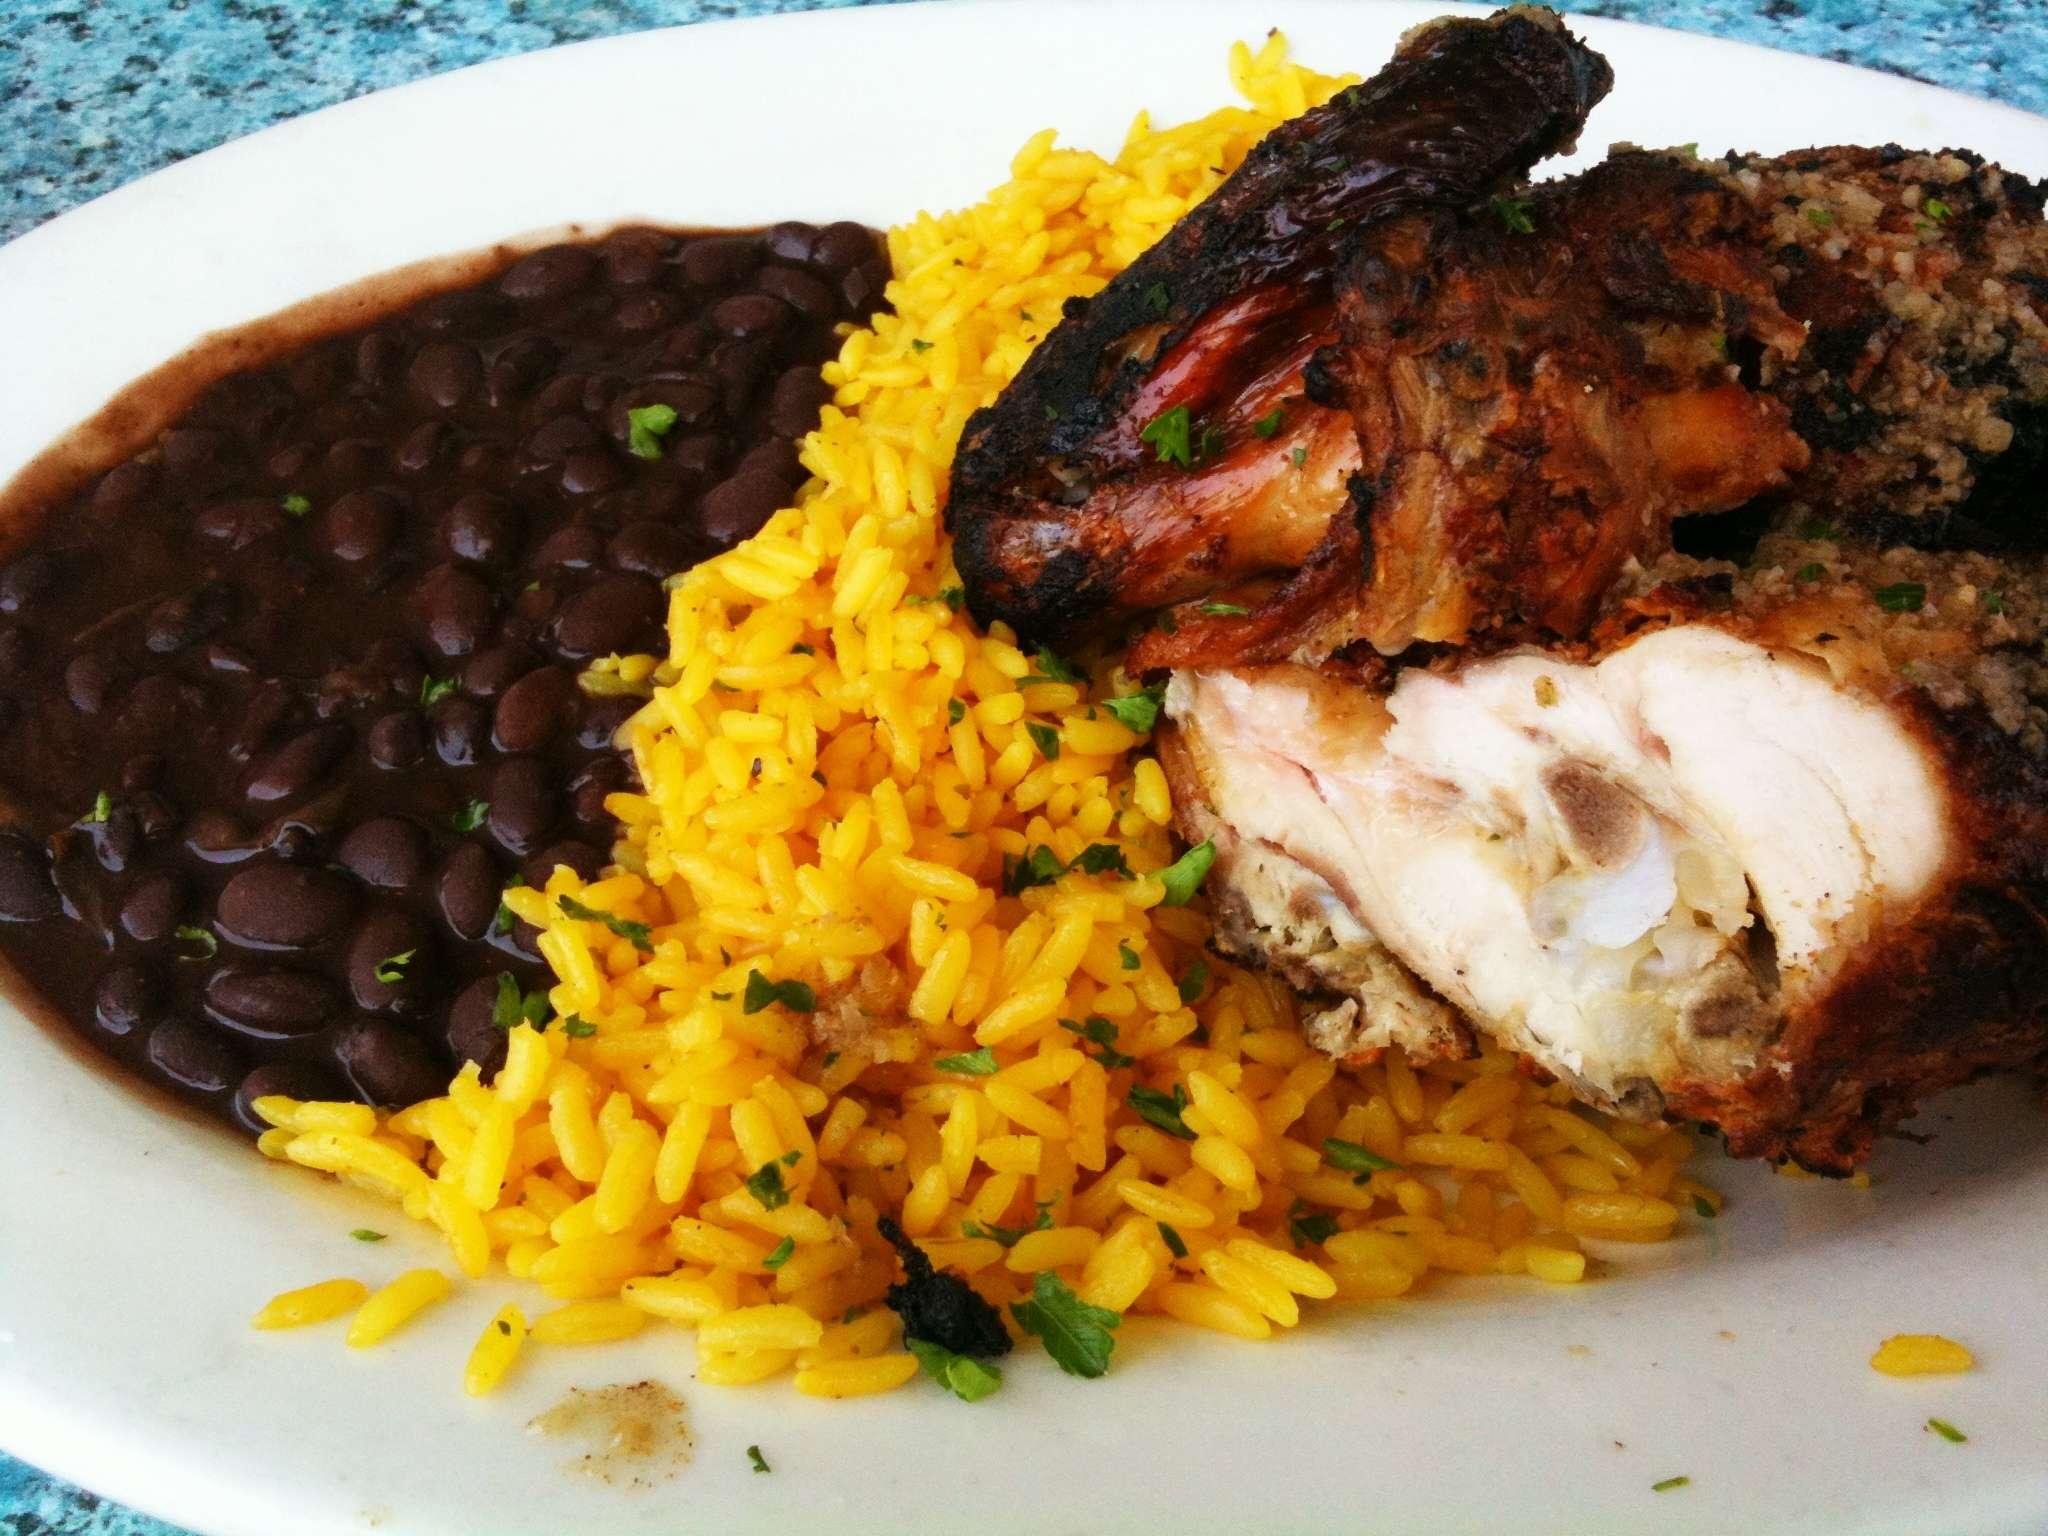 6 best cuban restaurants in atlanta gafollowers - Cuban cuisine in miami ...